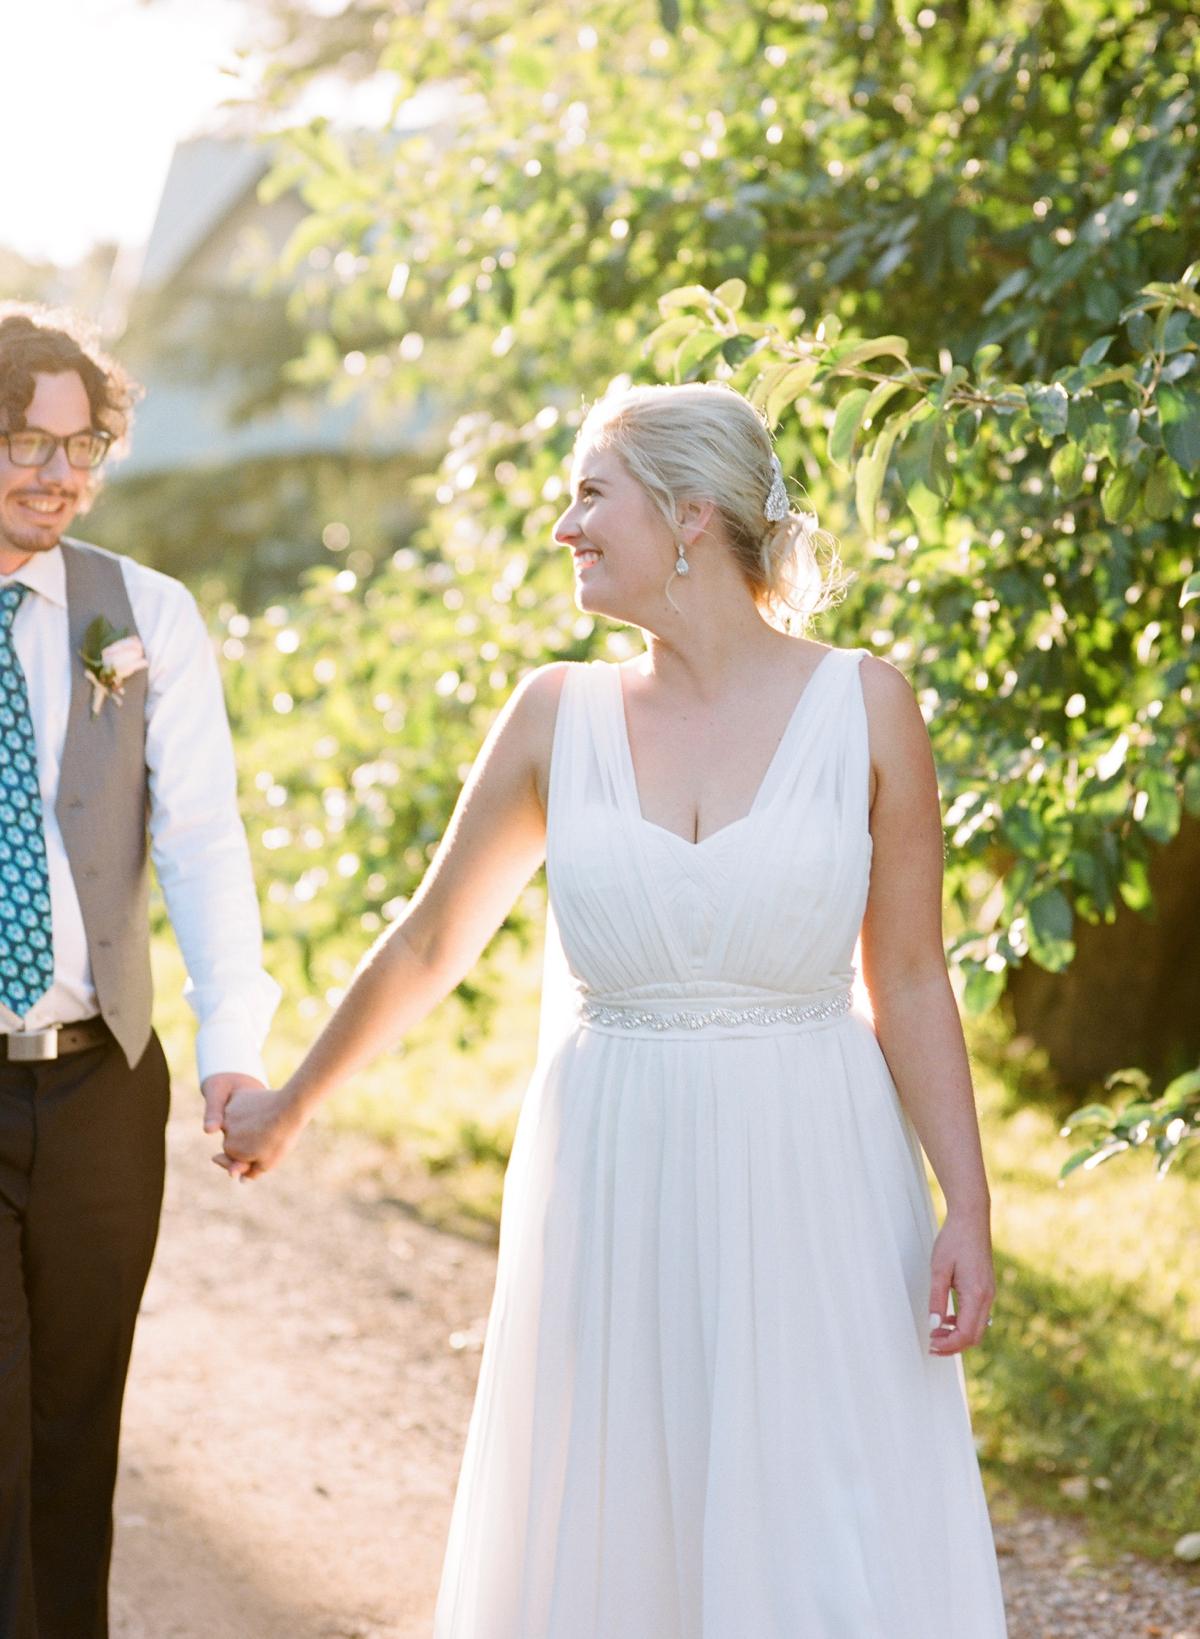 Monterose berry farm wedding by Mr Edwards Photography_0738.jpg